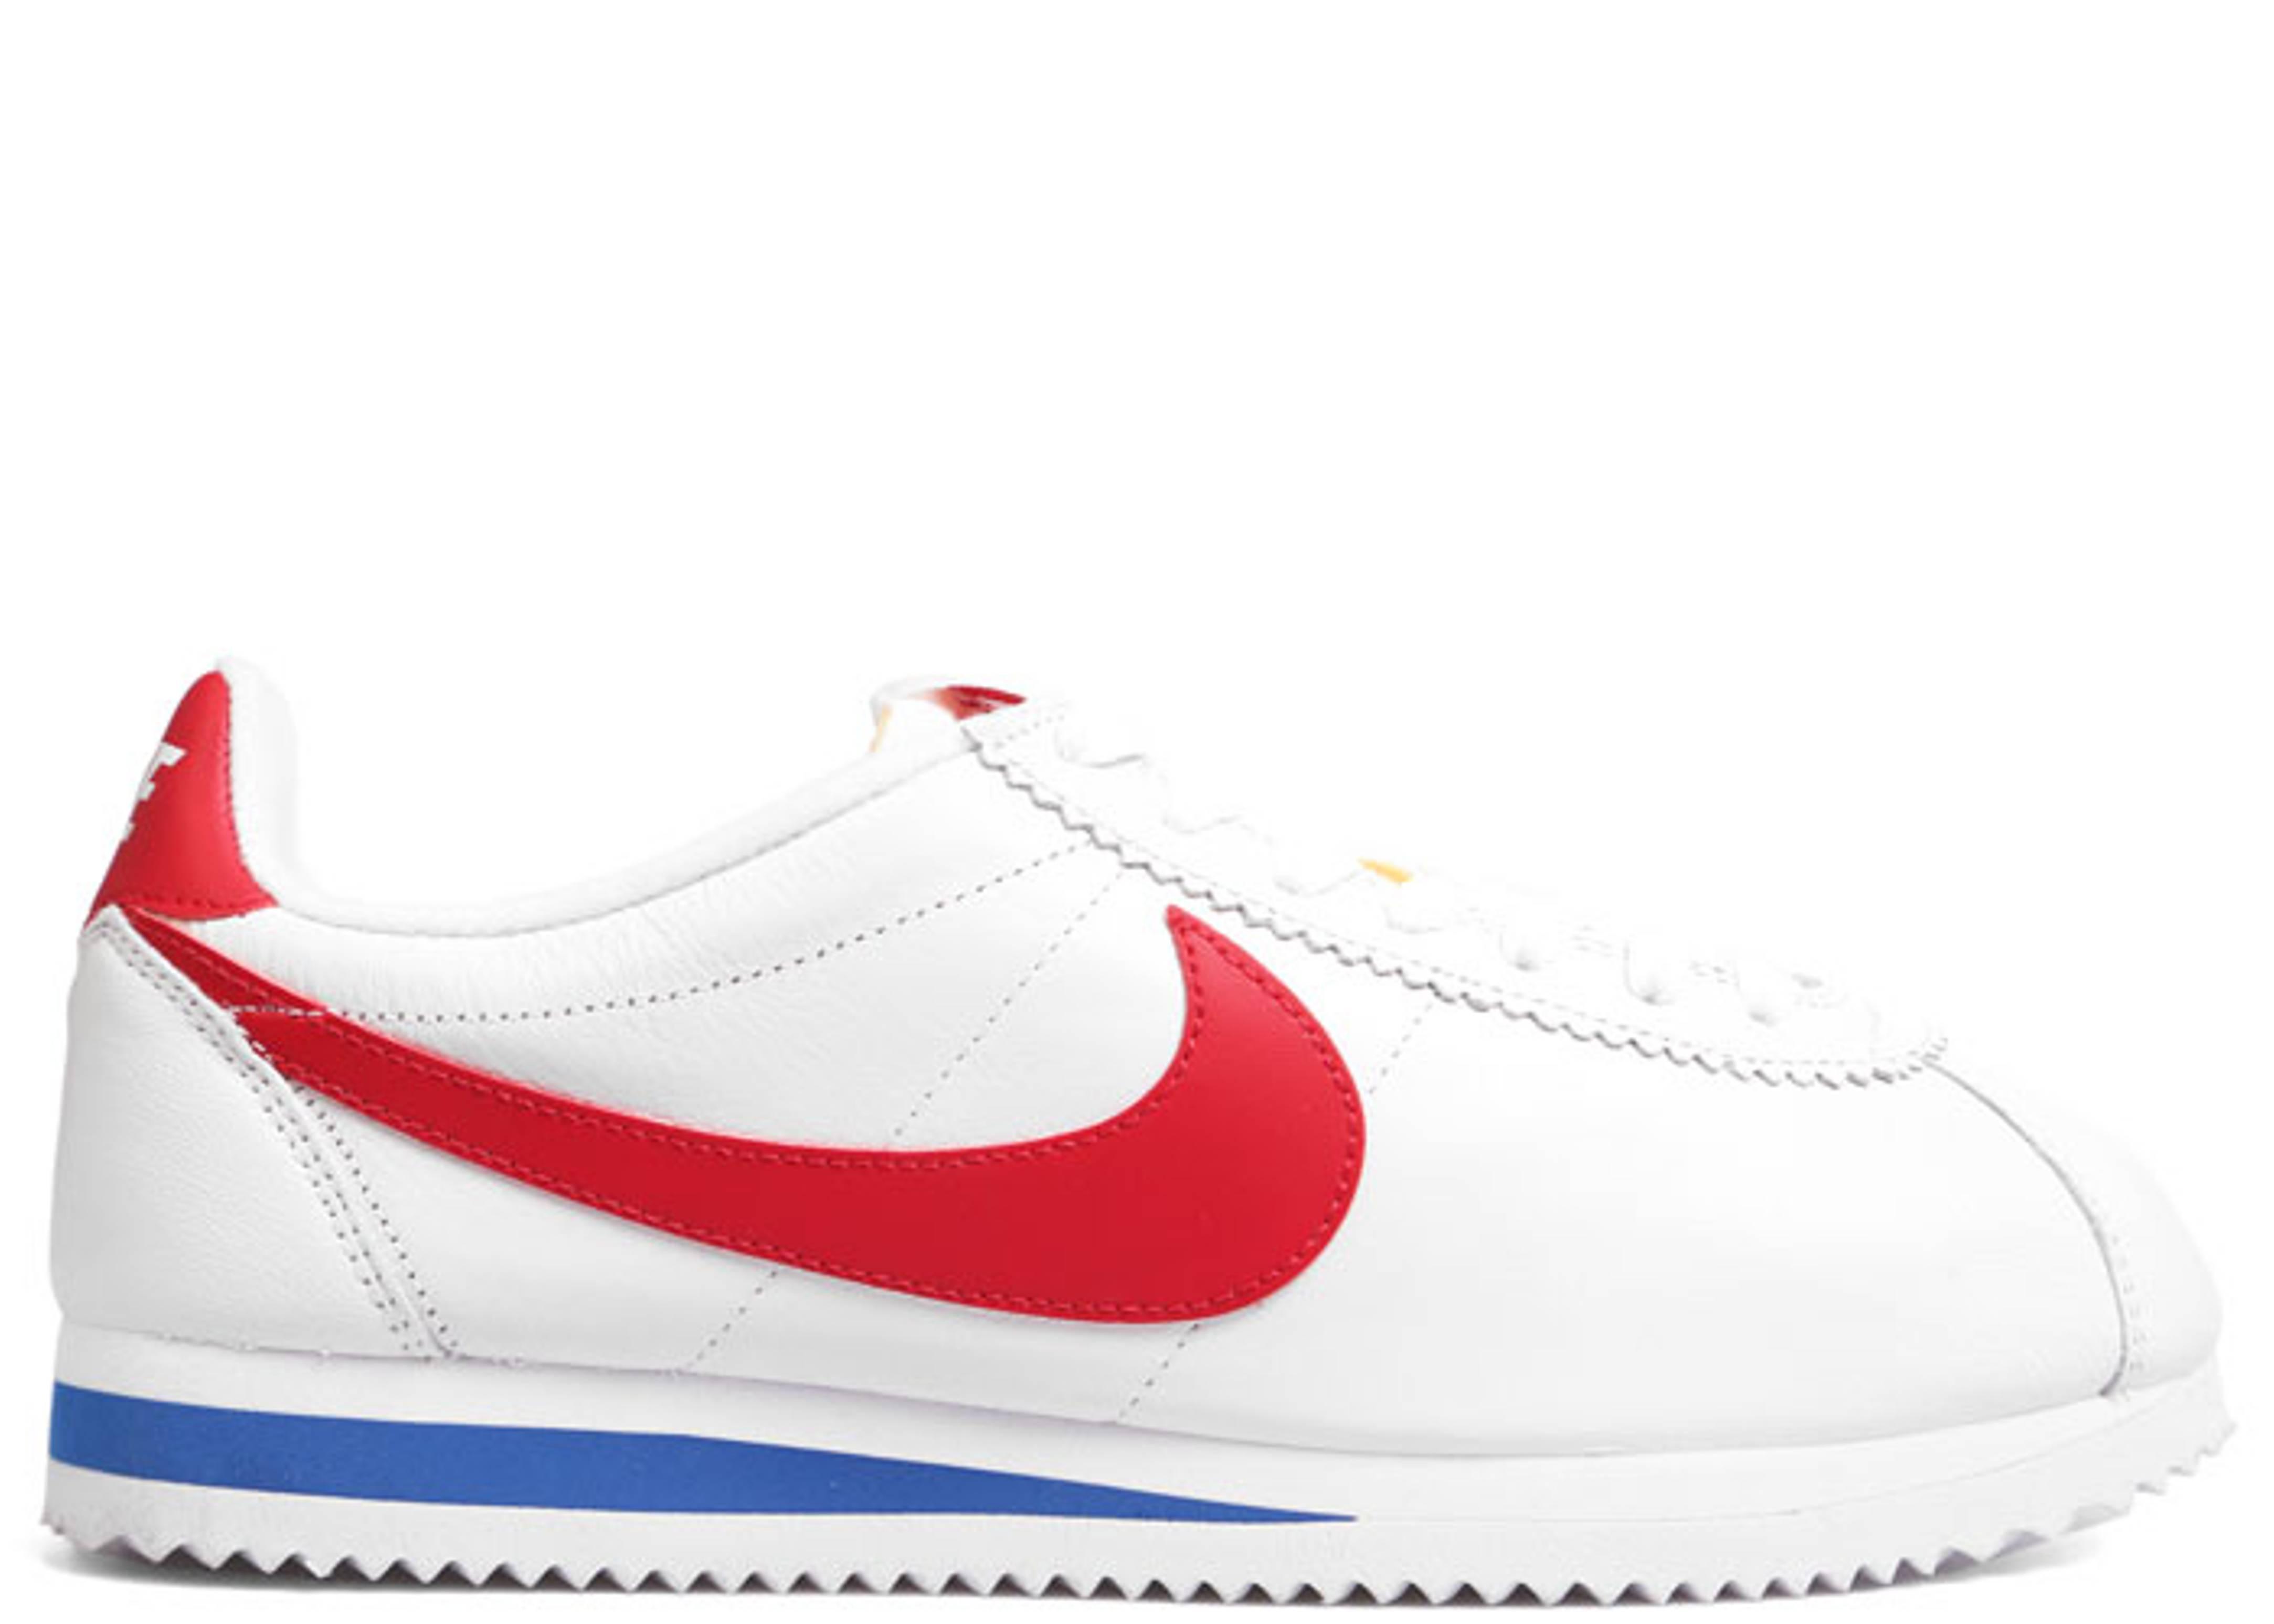 Forrest Gump New Shoes